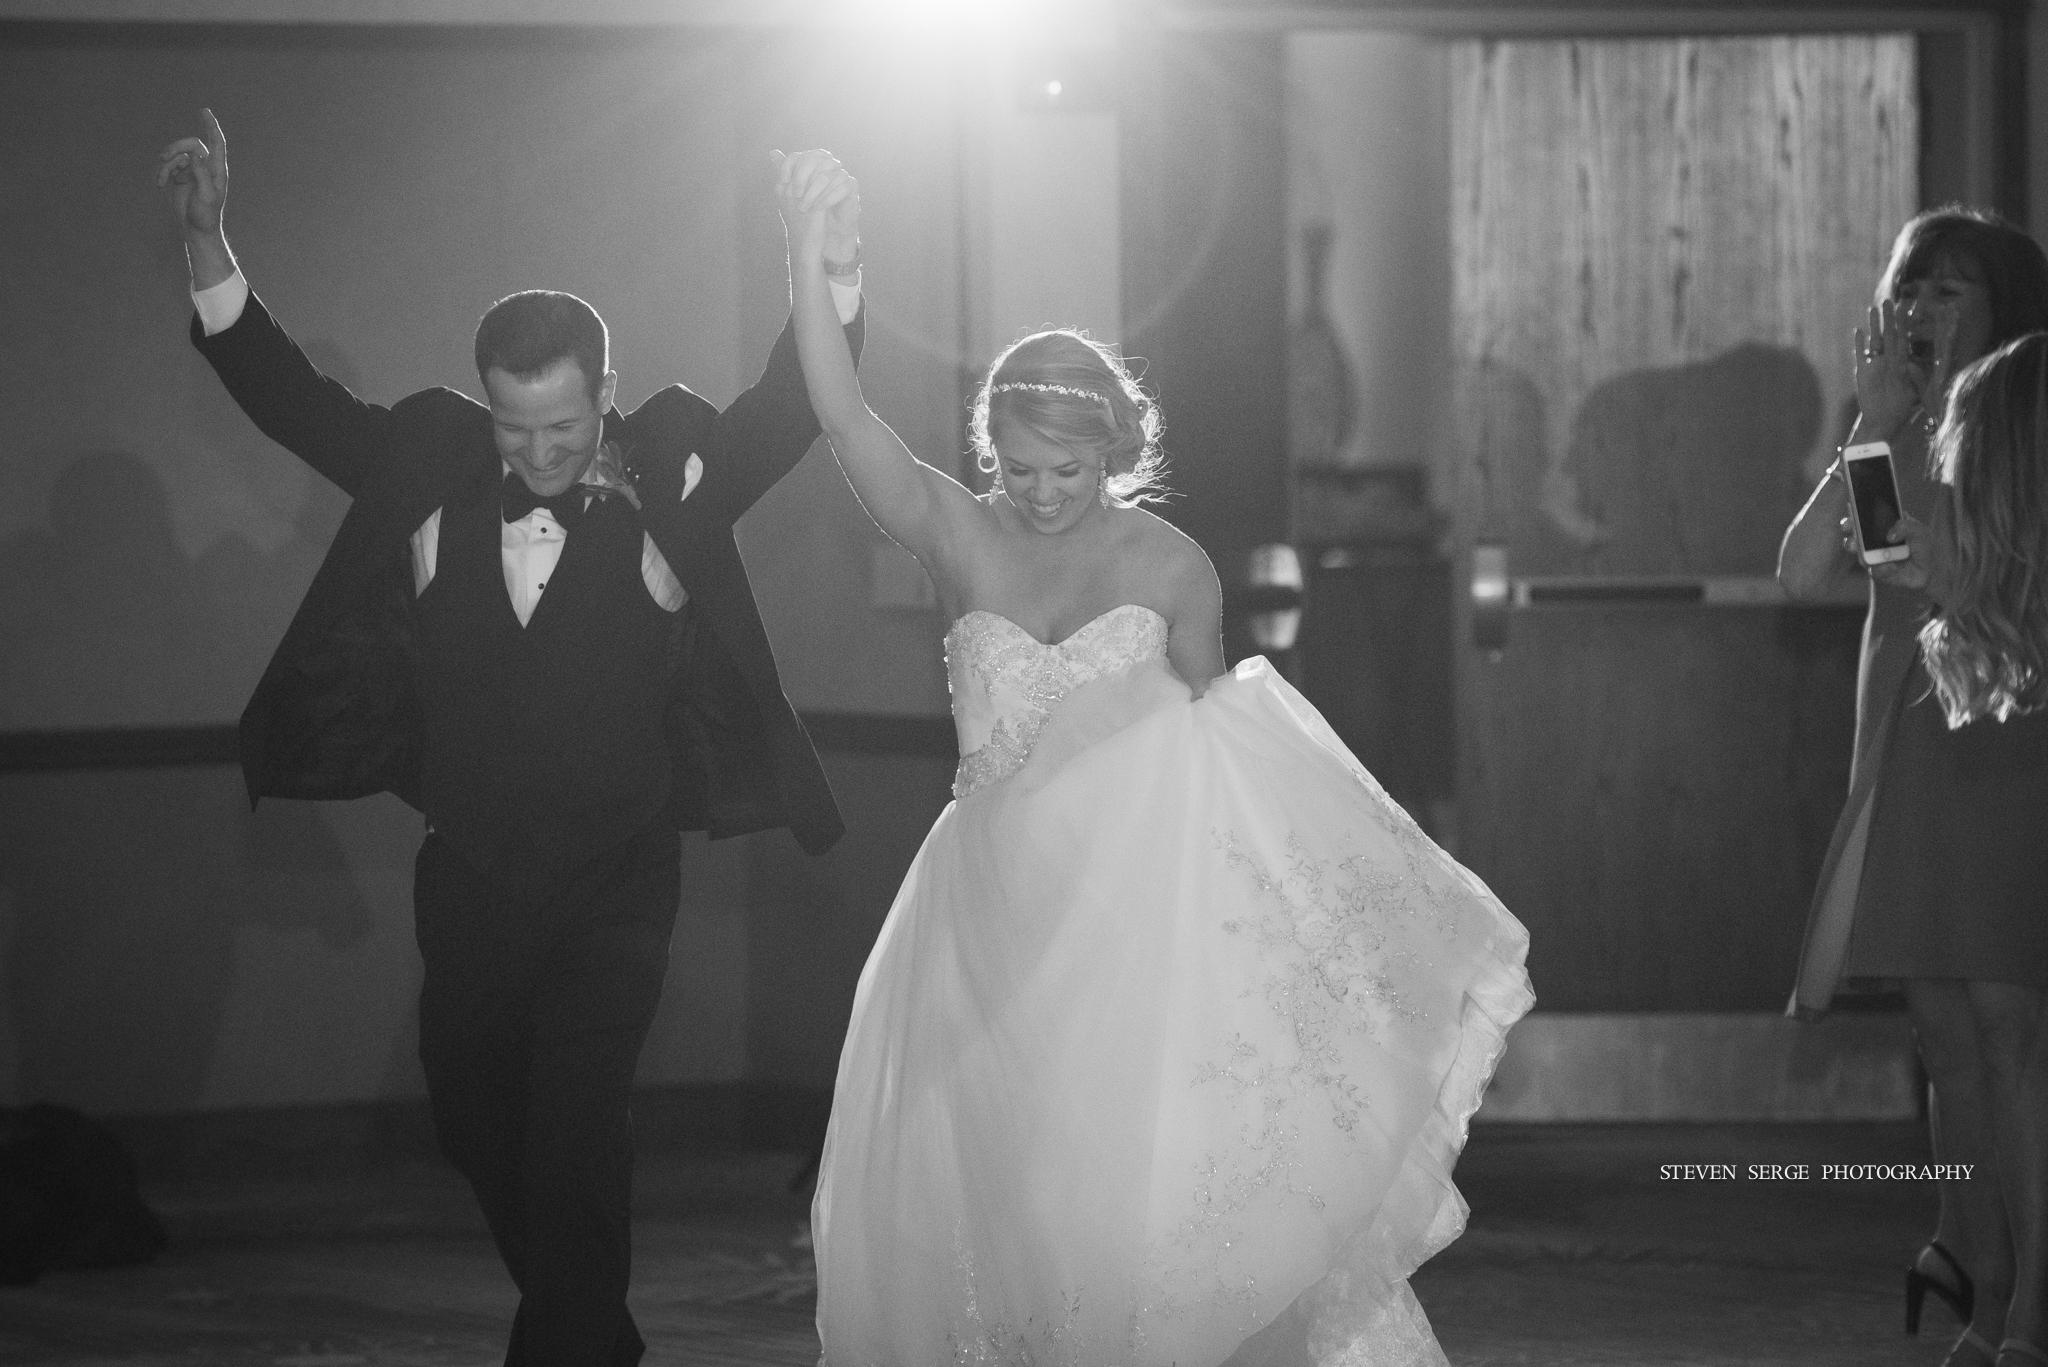 scranton-wedding-photographers-hilton-steven-serge-photography-11.jpg